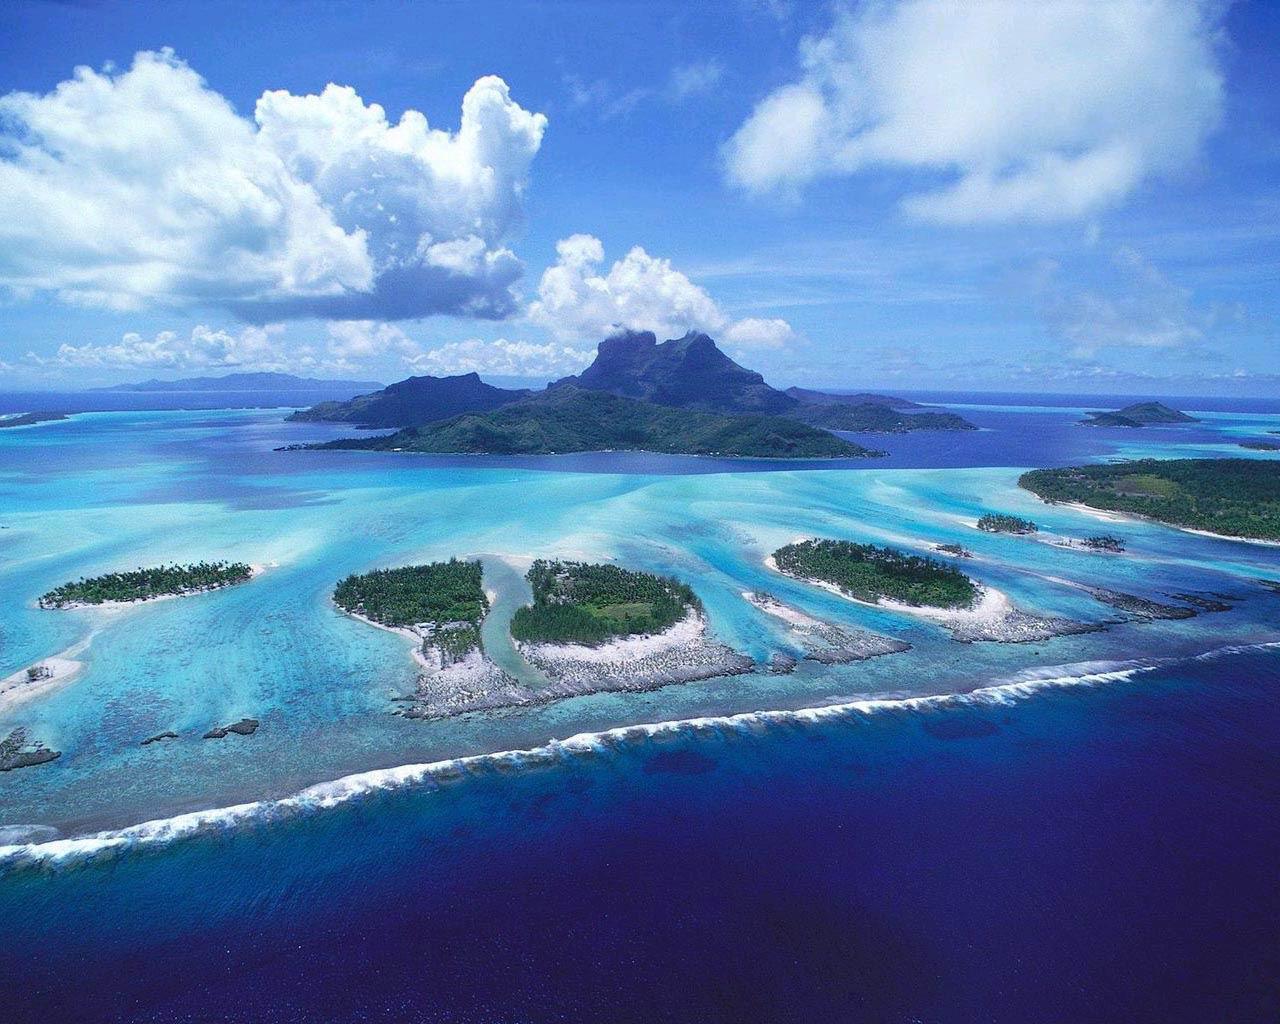 FULL WALLPAPER tropical island sunset wallpaper 1280x1024